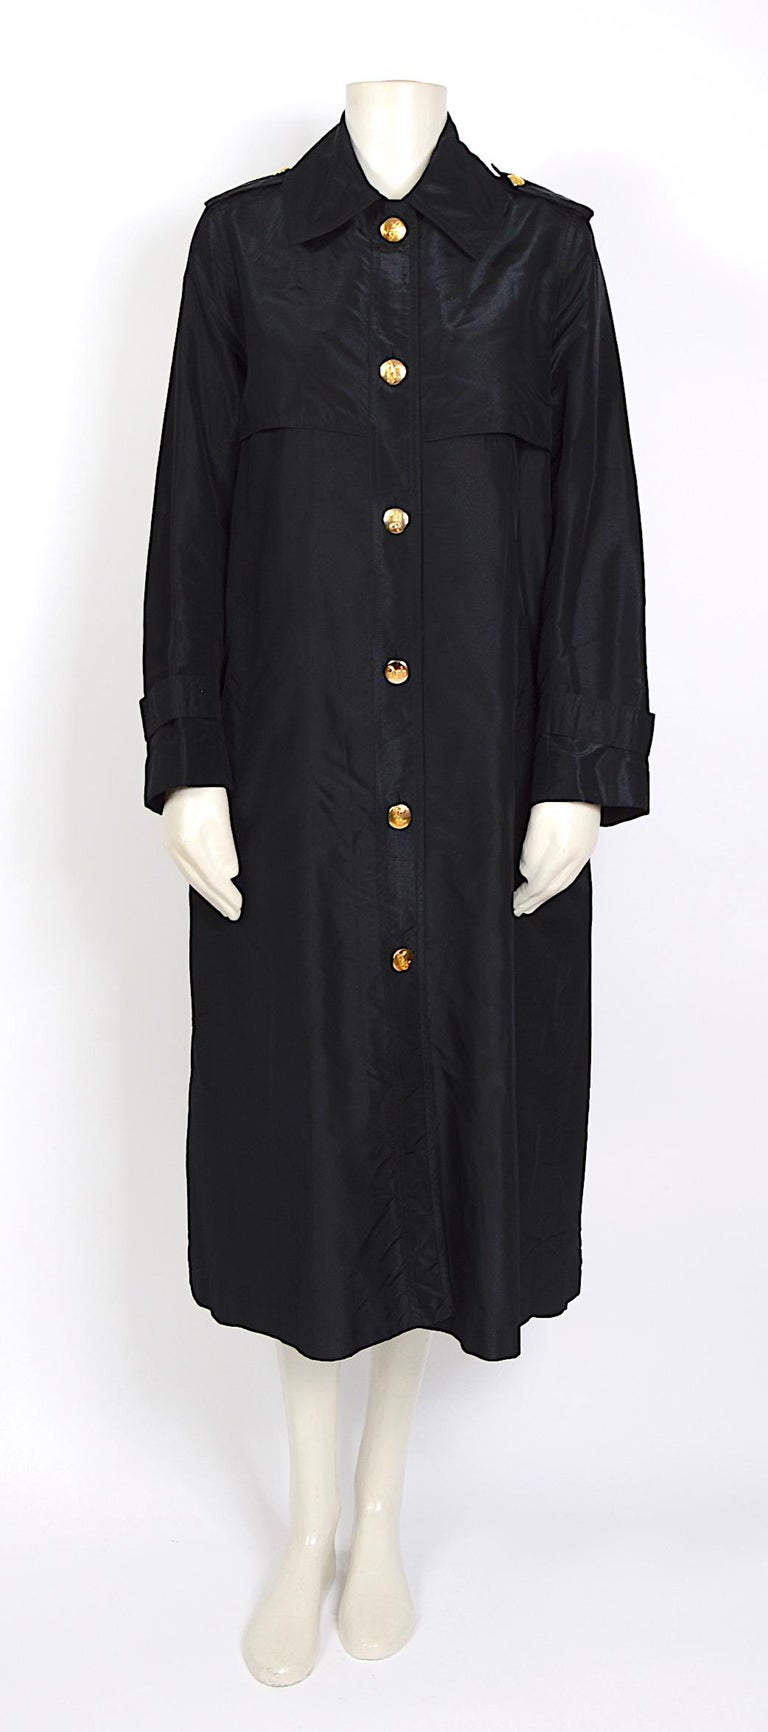 Women's Celine vintage signature gold buttons and black silk crispy taffeta coat For Sale